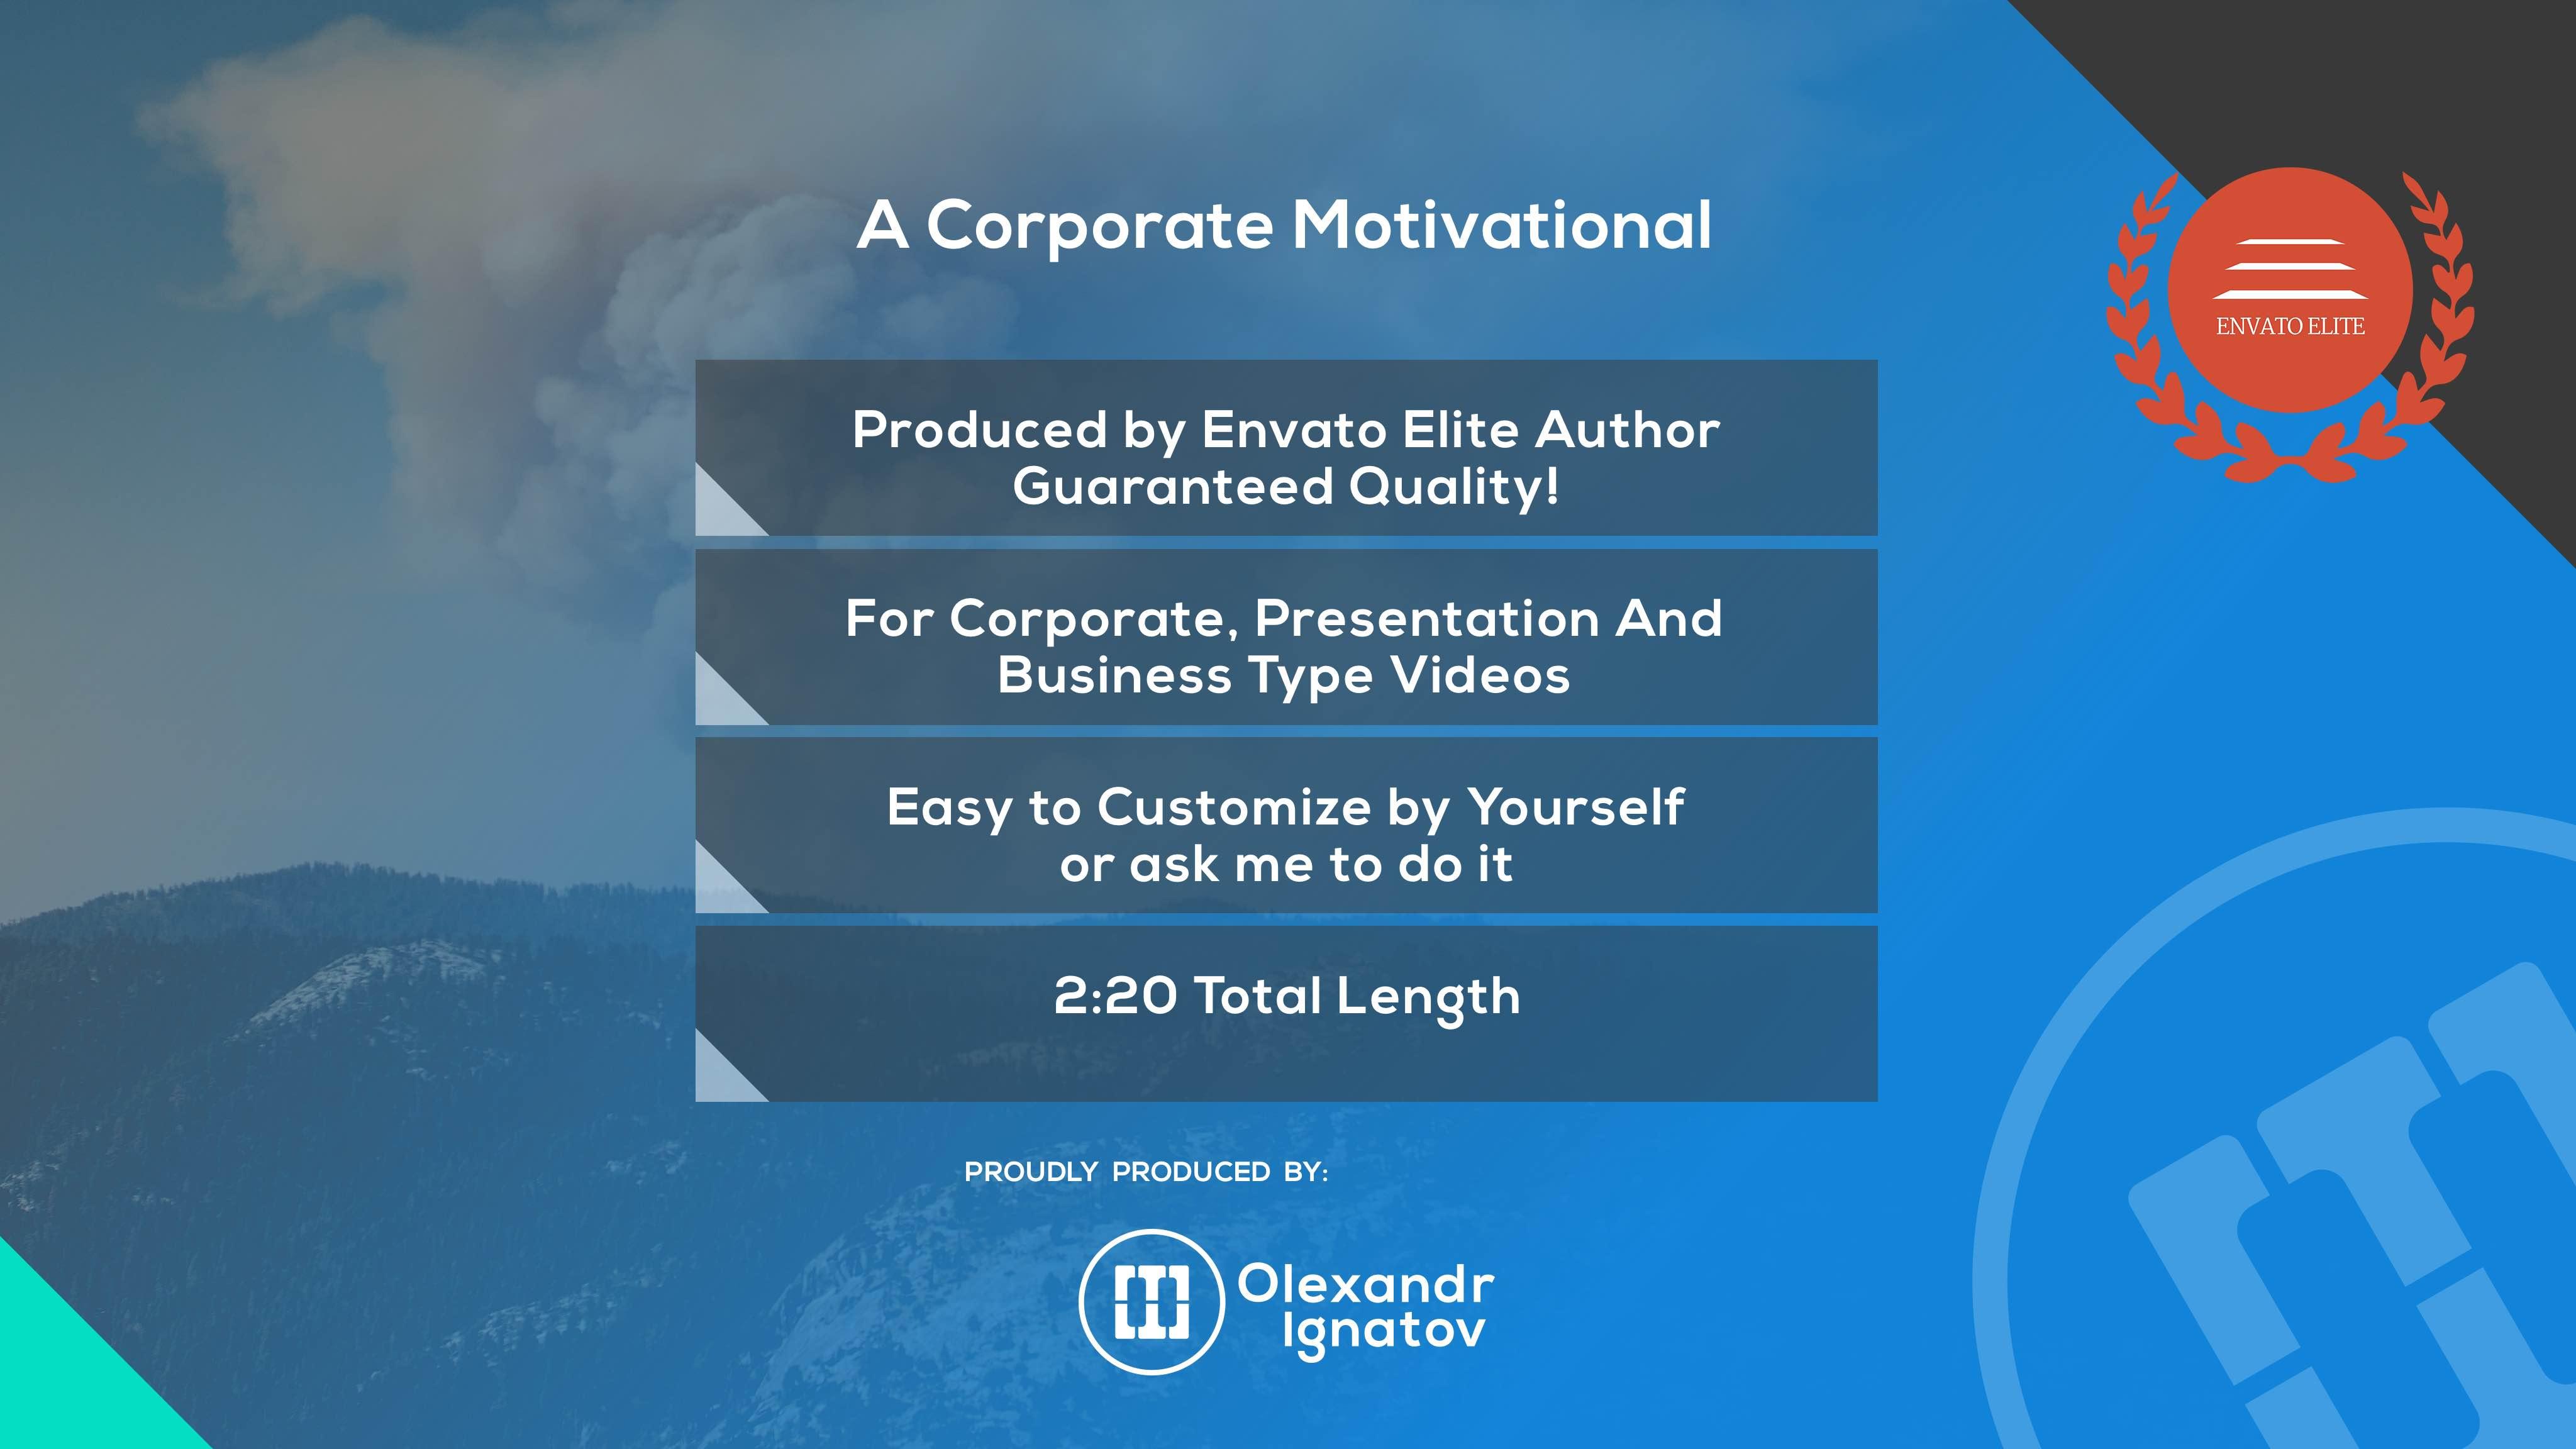 A Corporate Motivational - 2